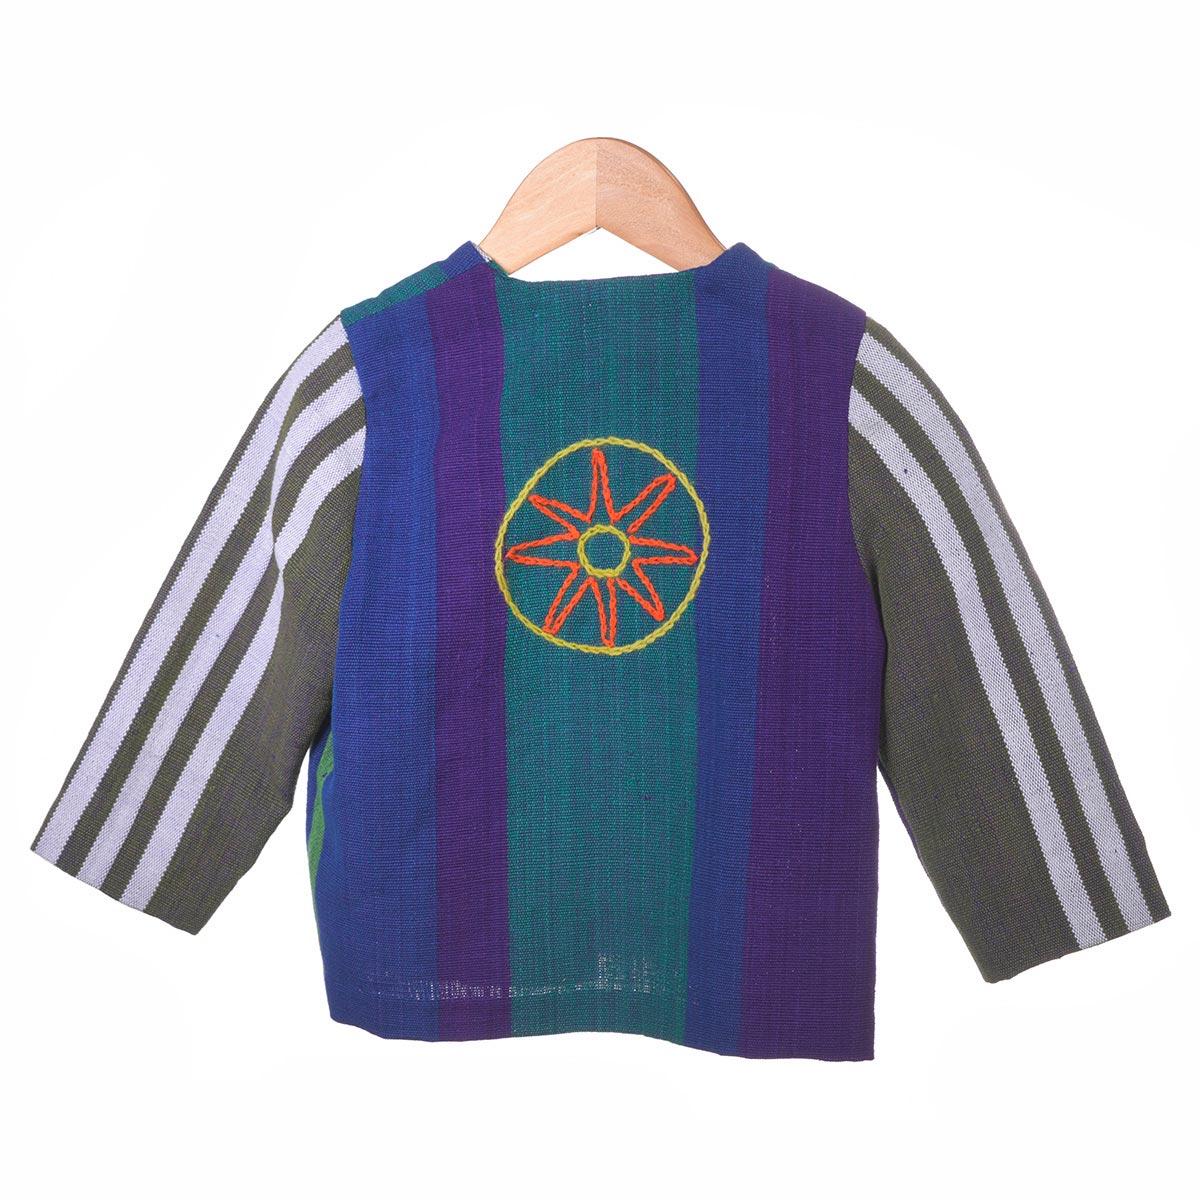 Gestreept jasje met borduursel cirkels achterzijde